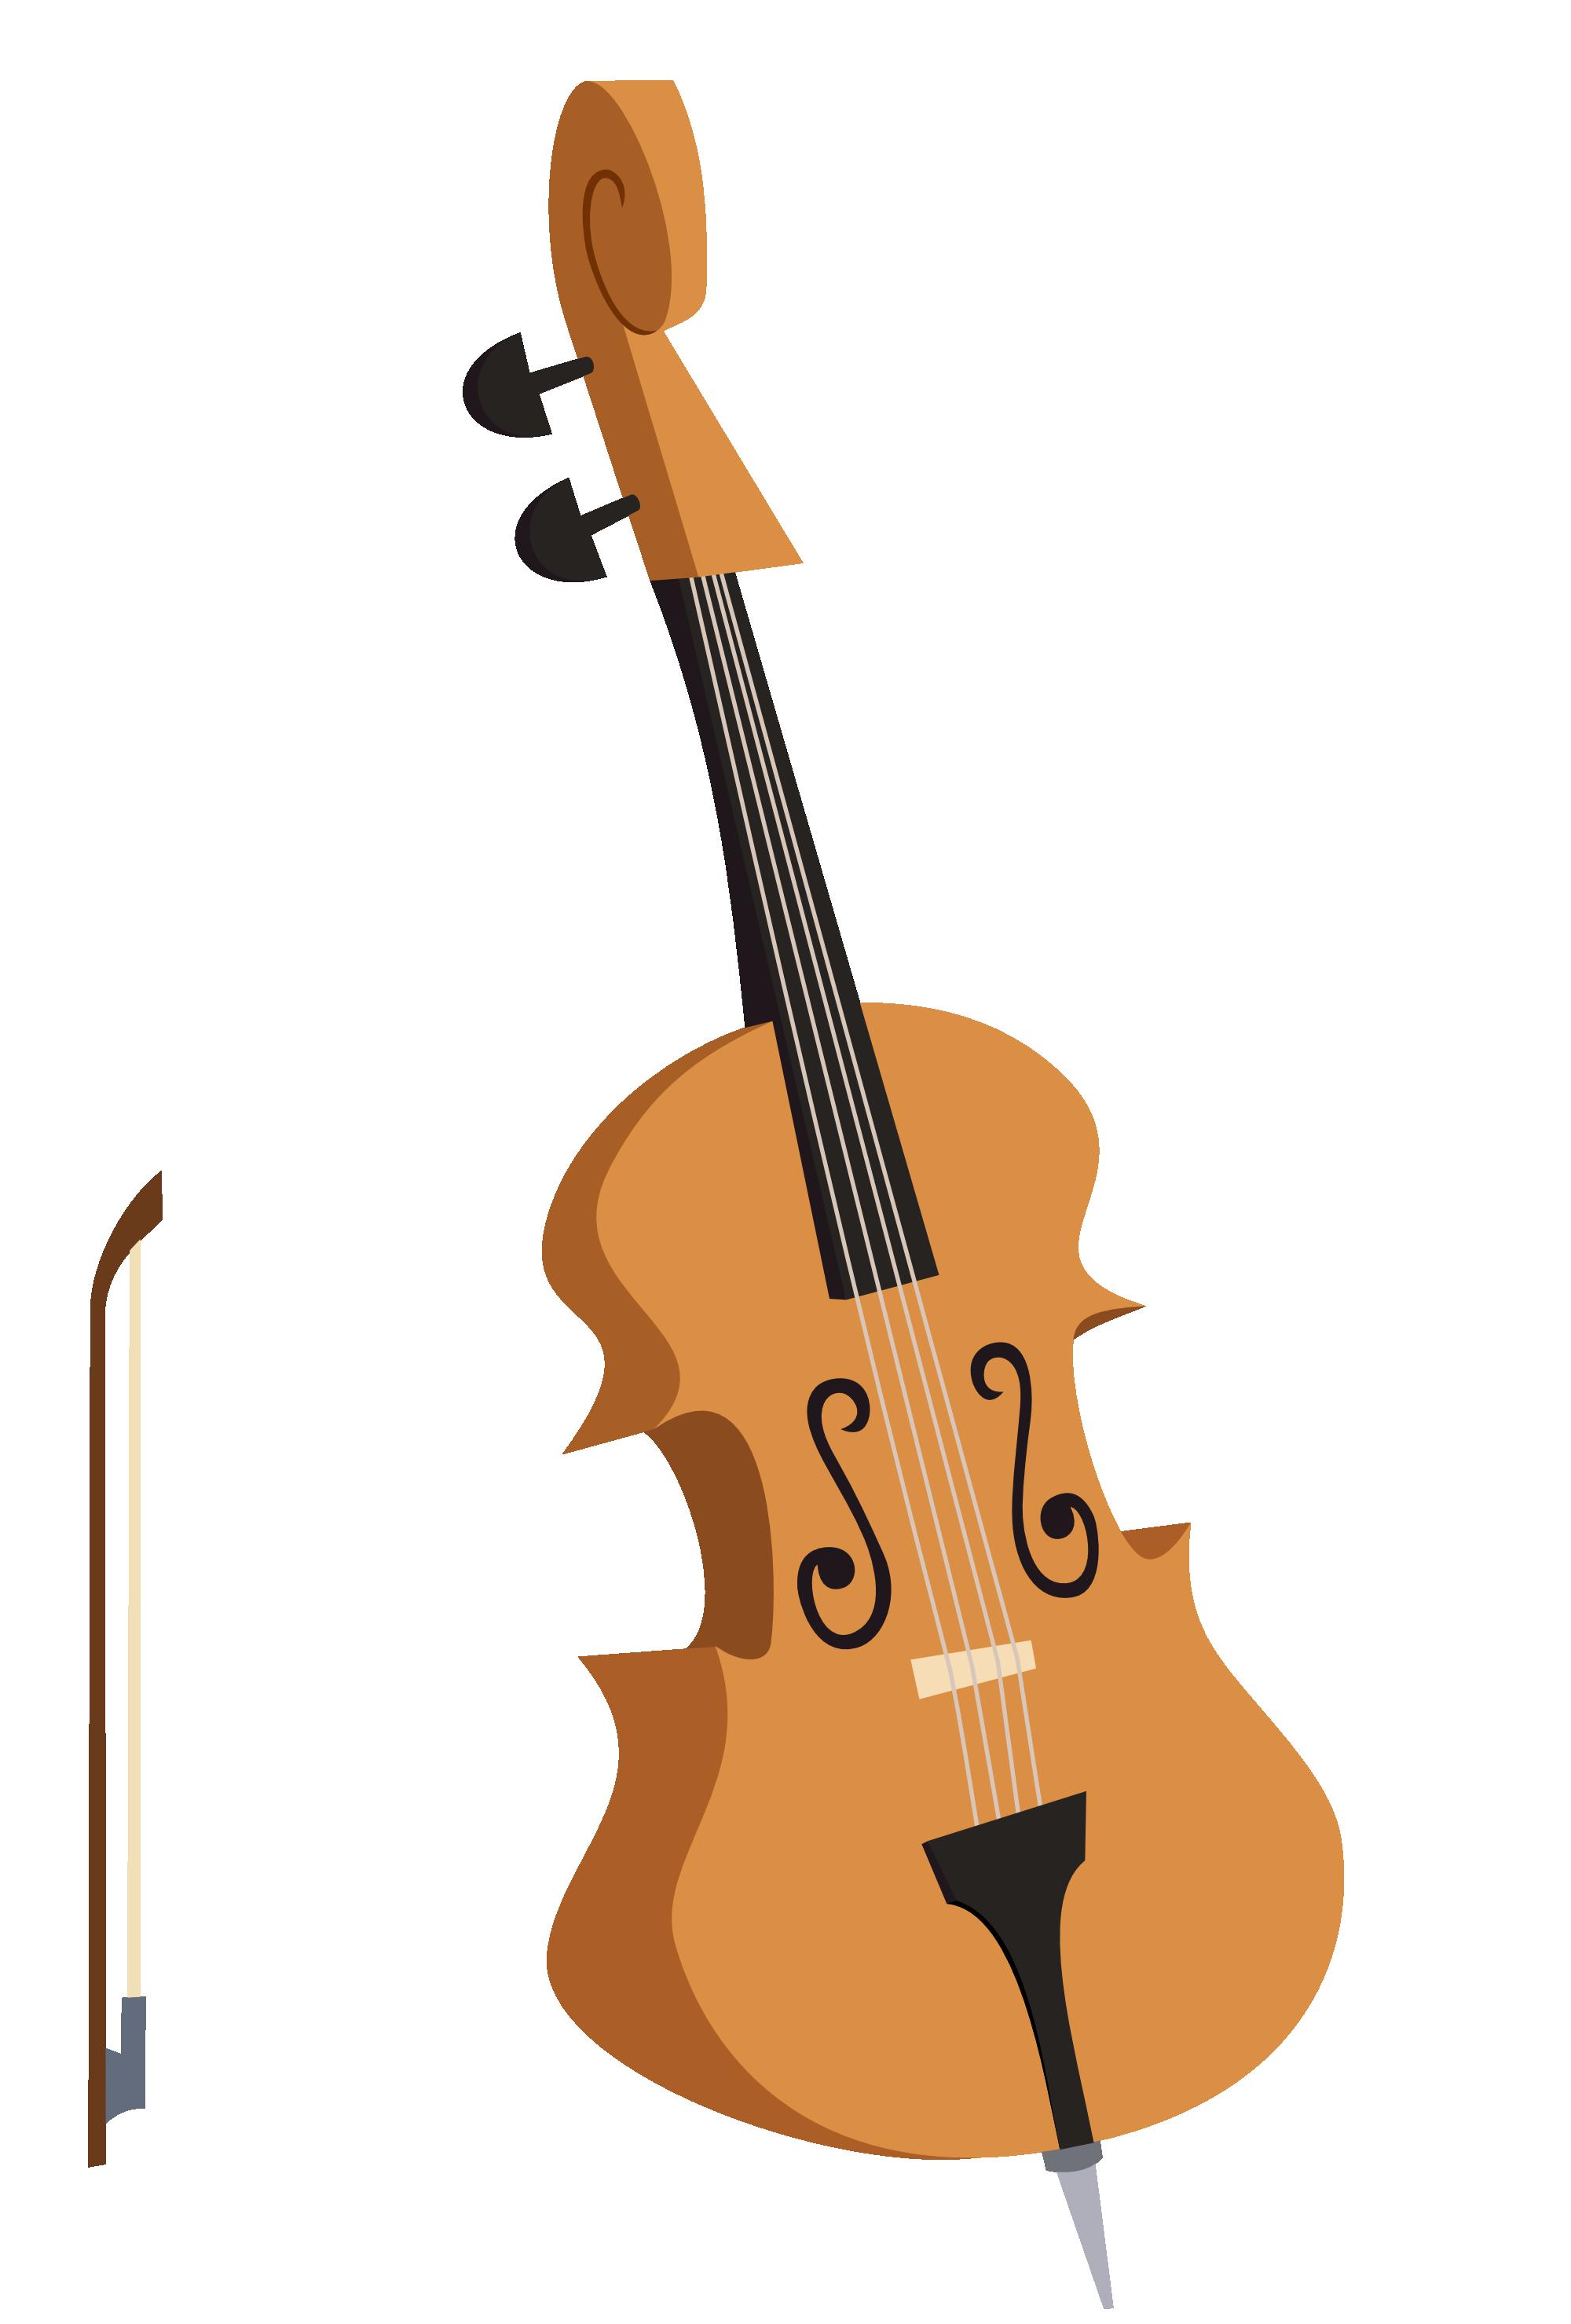 Clipart guitar octavina. Free fishing clip art